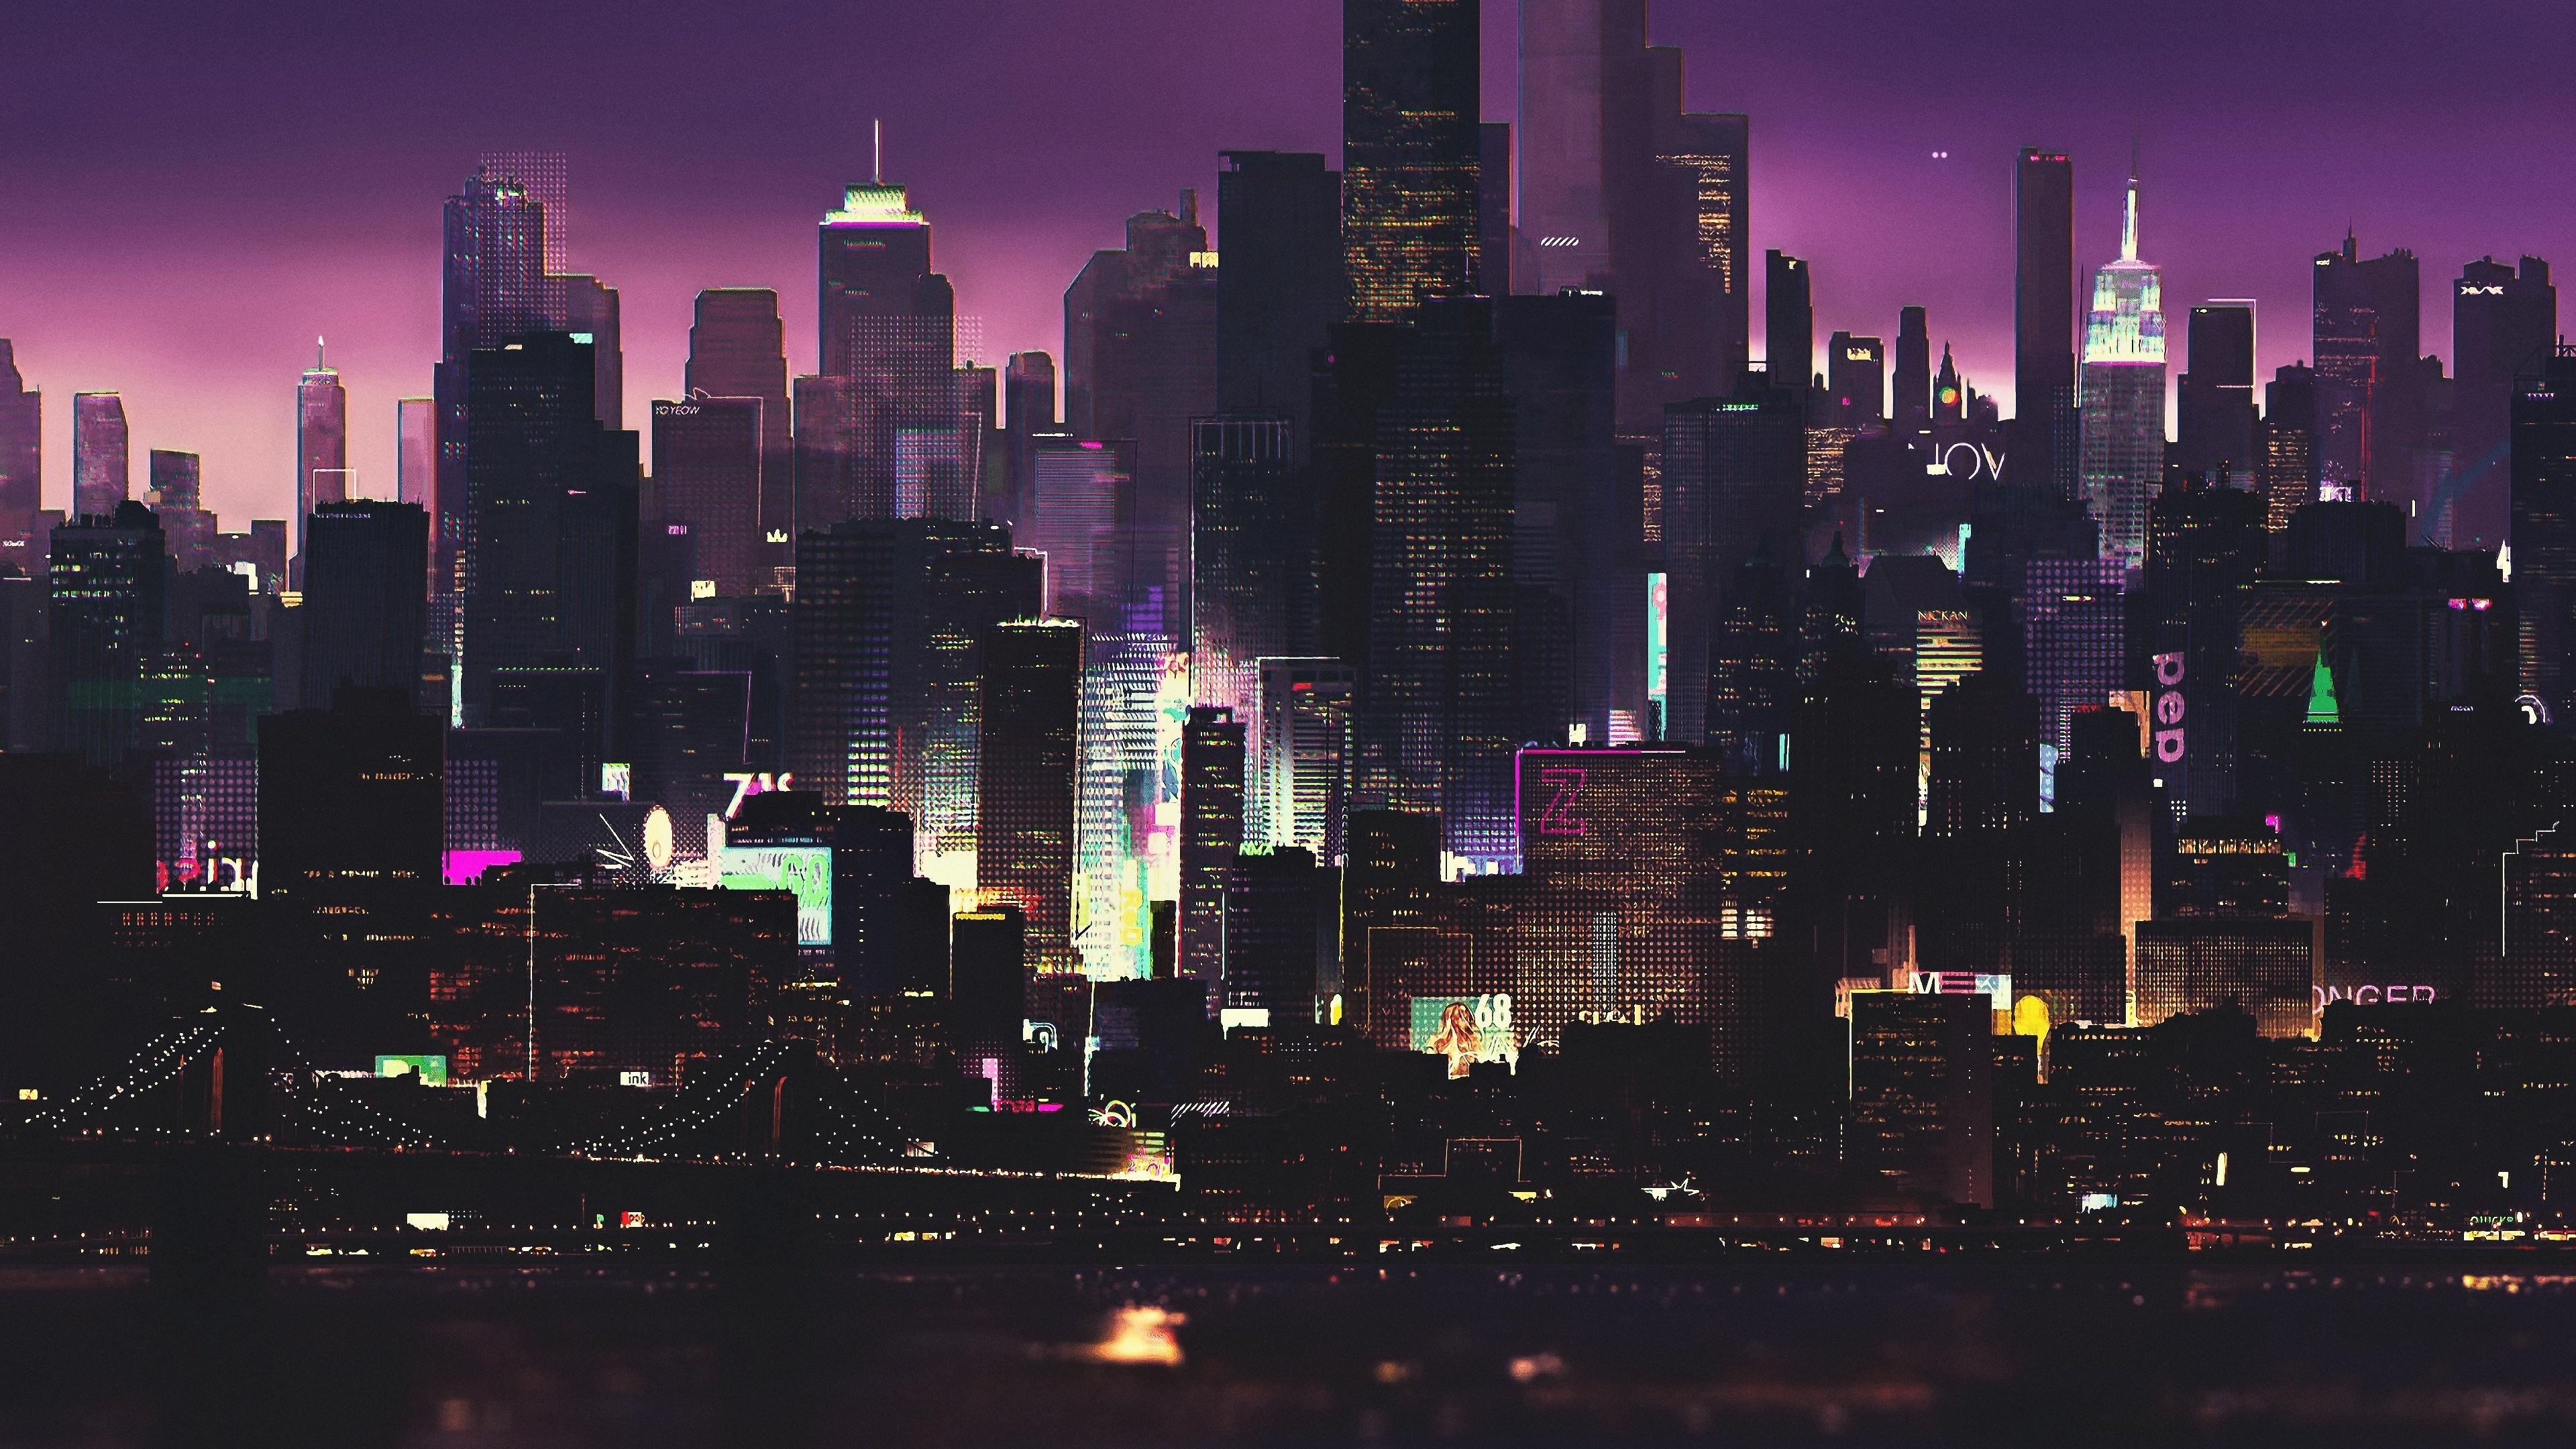 Cyberpunk, buildings, dark, night, cityscape, art, 3840x2160 wallpaper